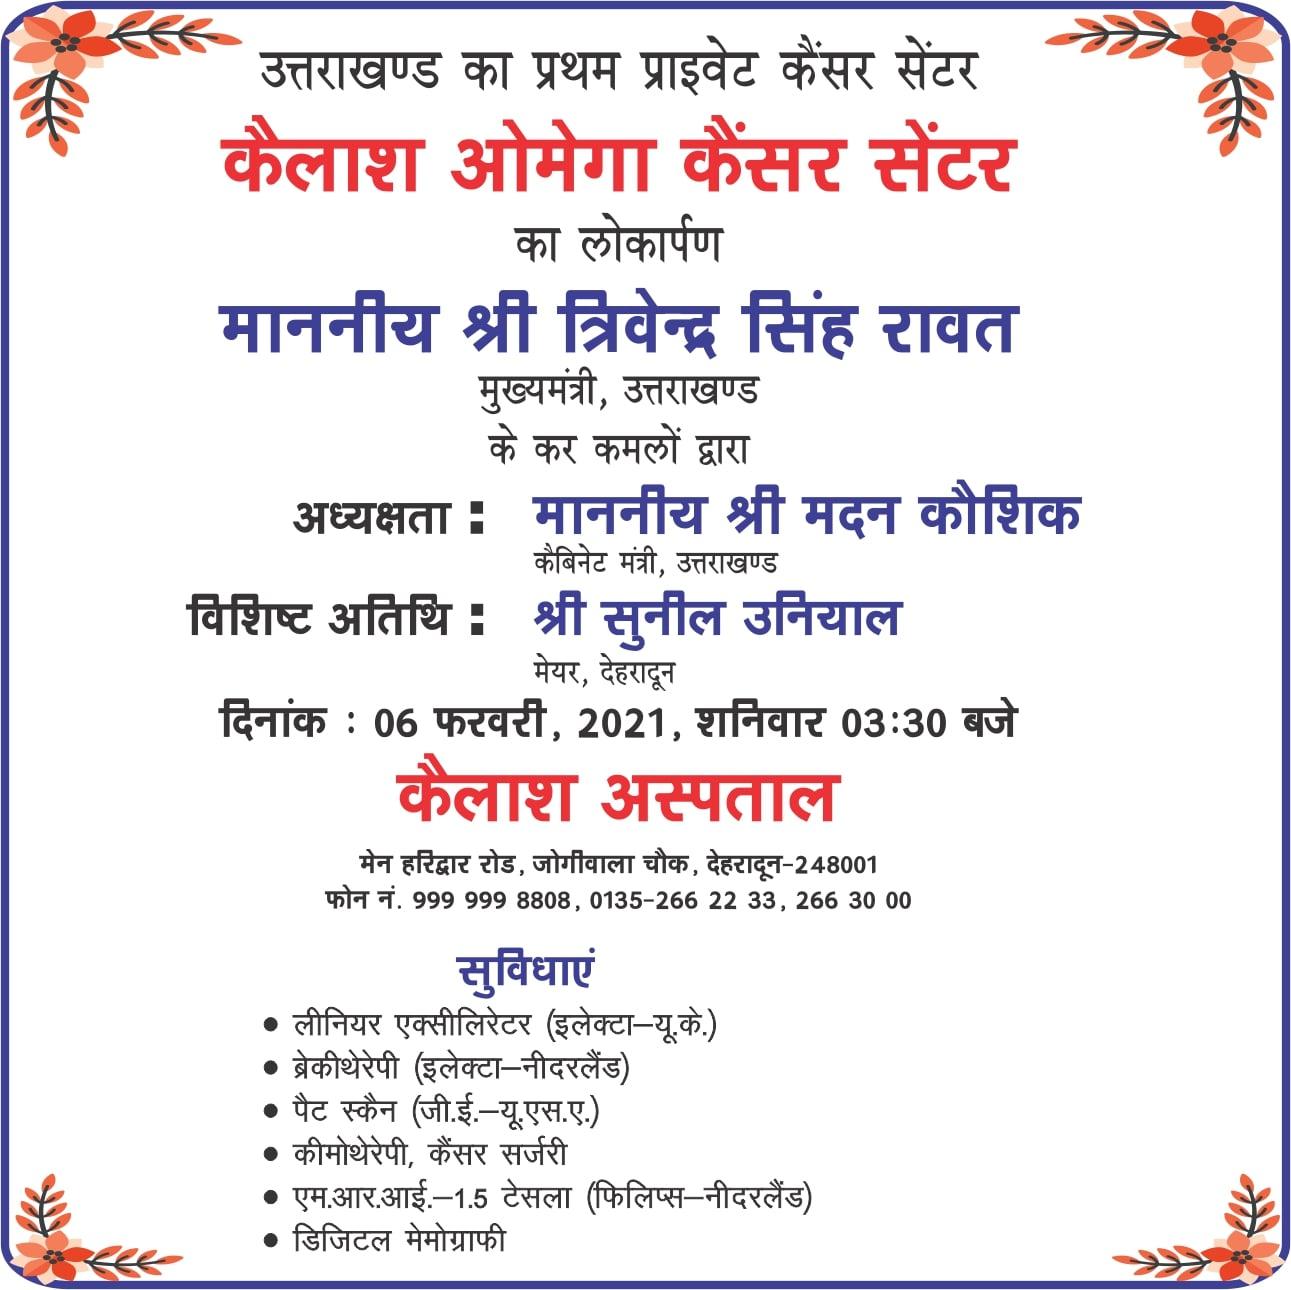 Inauguration of Uttarakhand's First Private Cancer Center ′′ Kailash Omega Cancer Center ′′